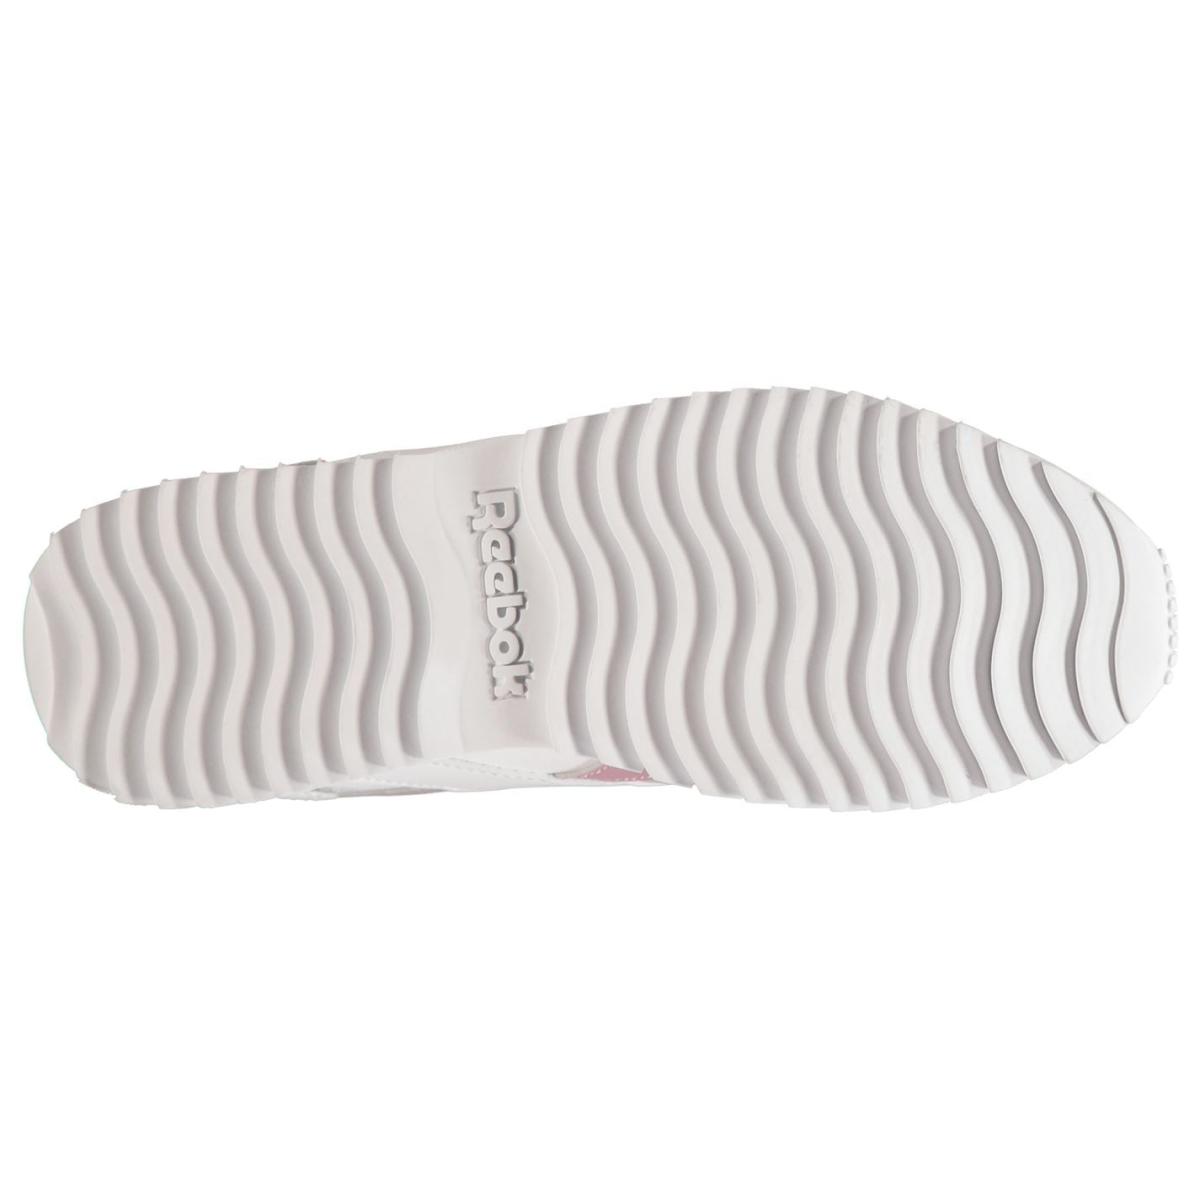 Reebok-Royal-Glide-Turnschuhe-Laufschuhe-Damen-Sneaker-Trainers-Sportschuhe-8001 Indexbild 6